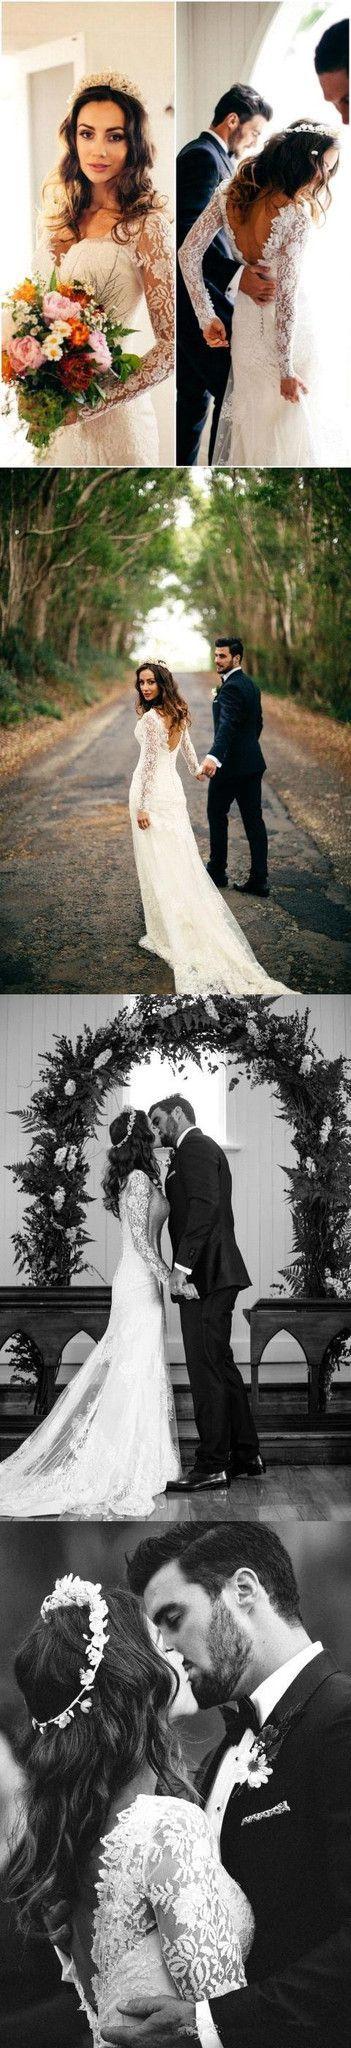 Elegant Lace Long Sleeve Wedding Dresss Latest V-Neck Open Back Bridal Dresses , PD0225